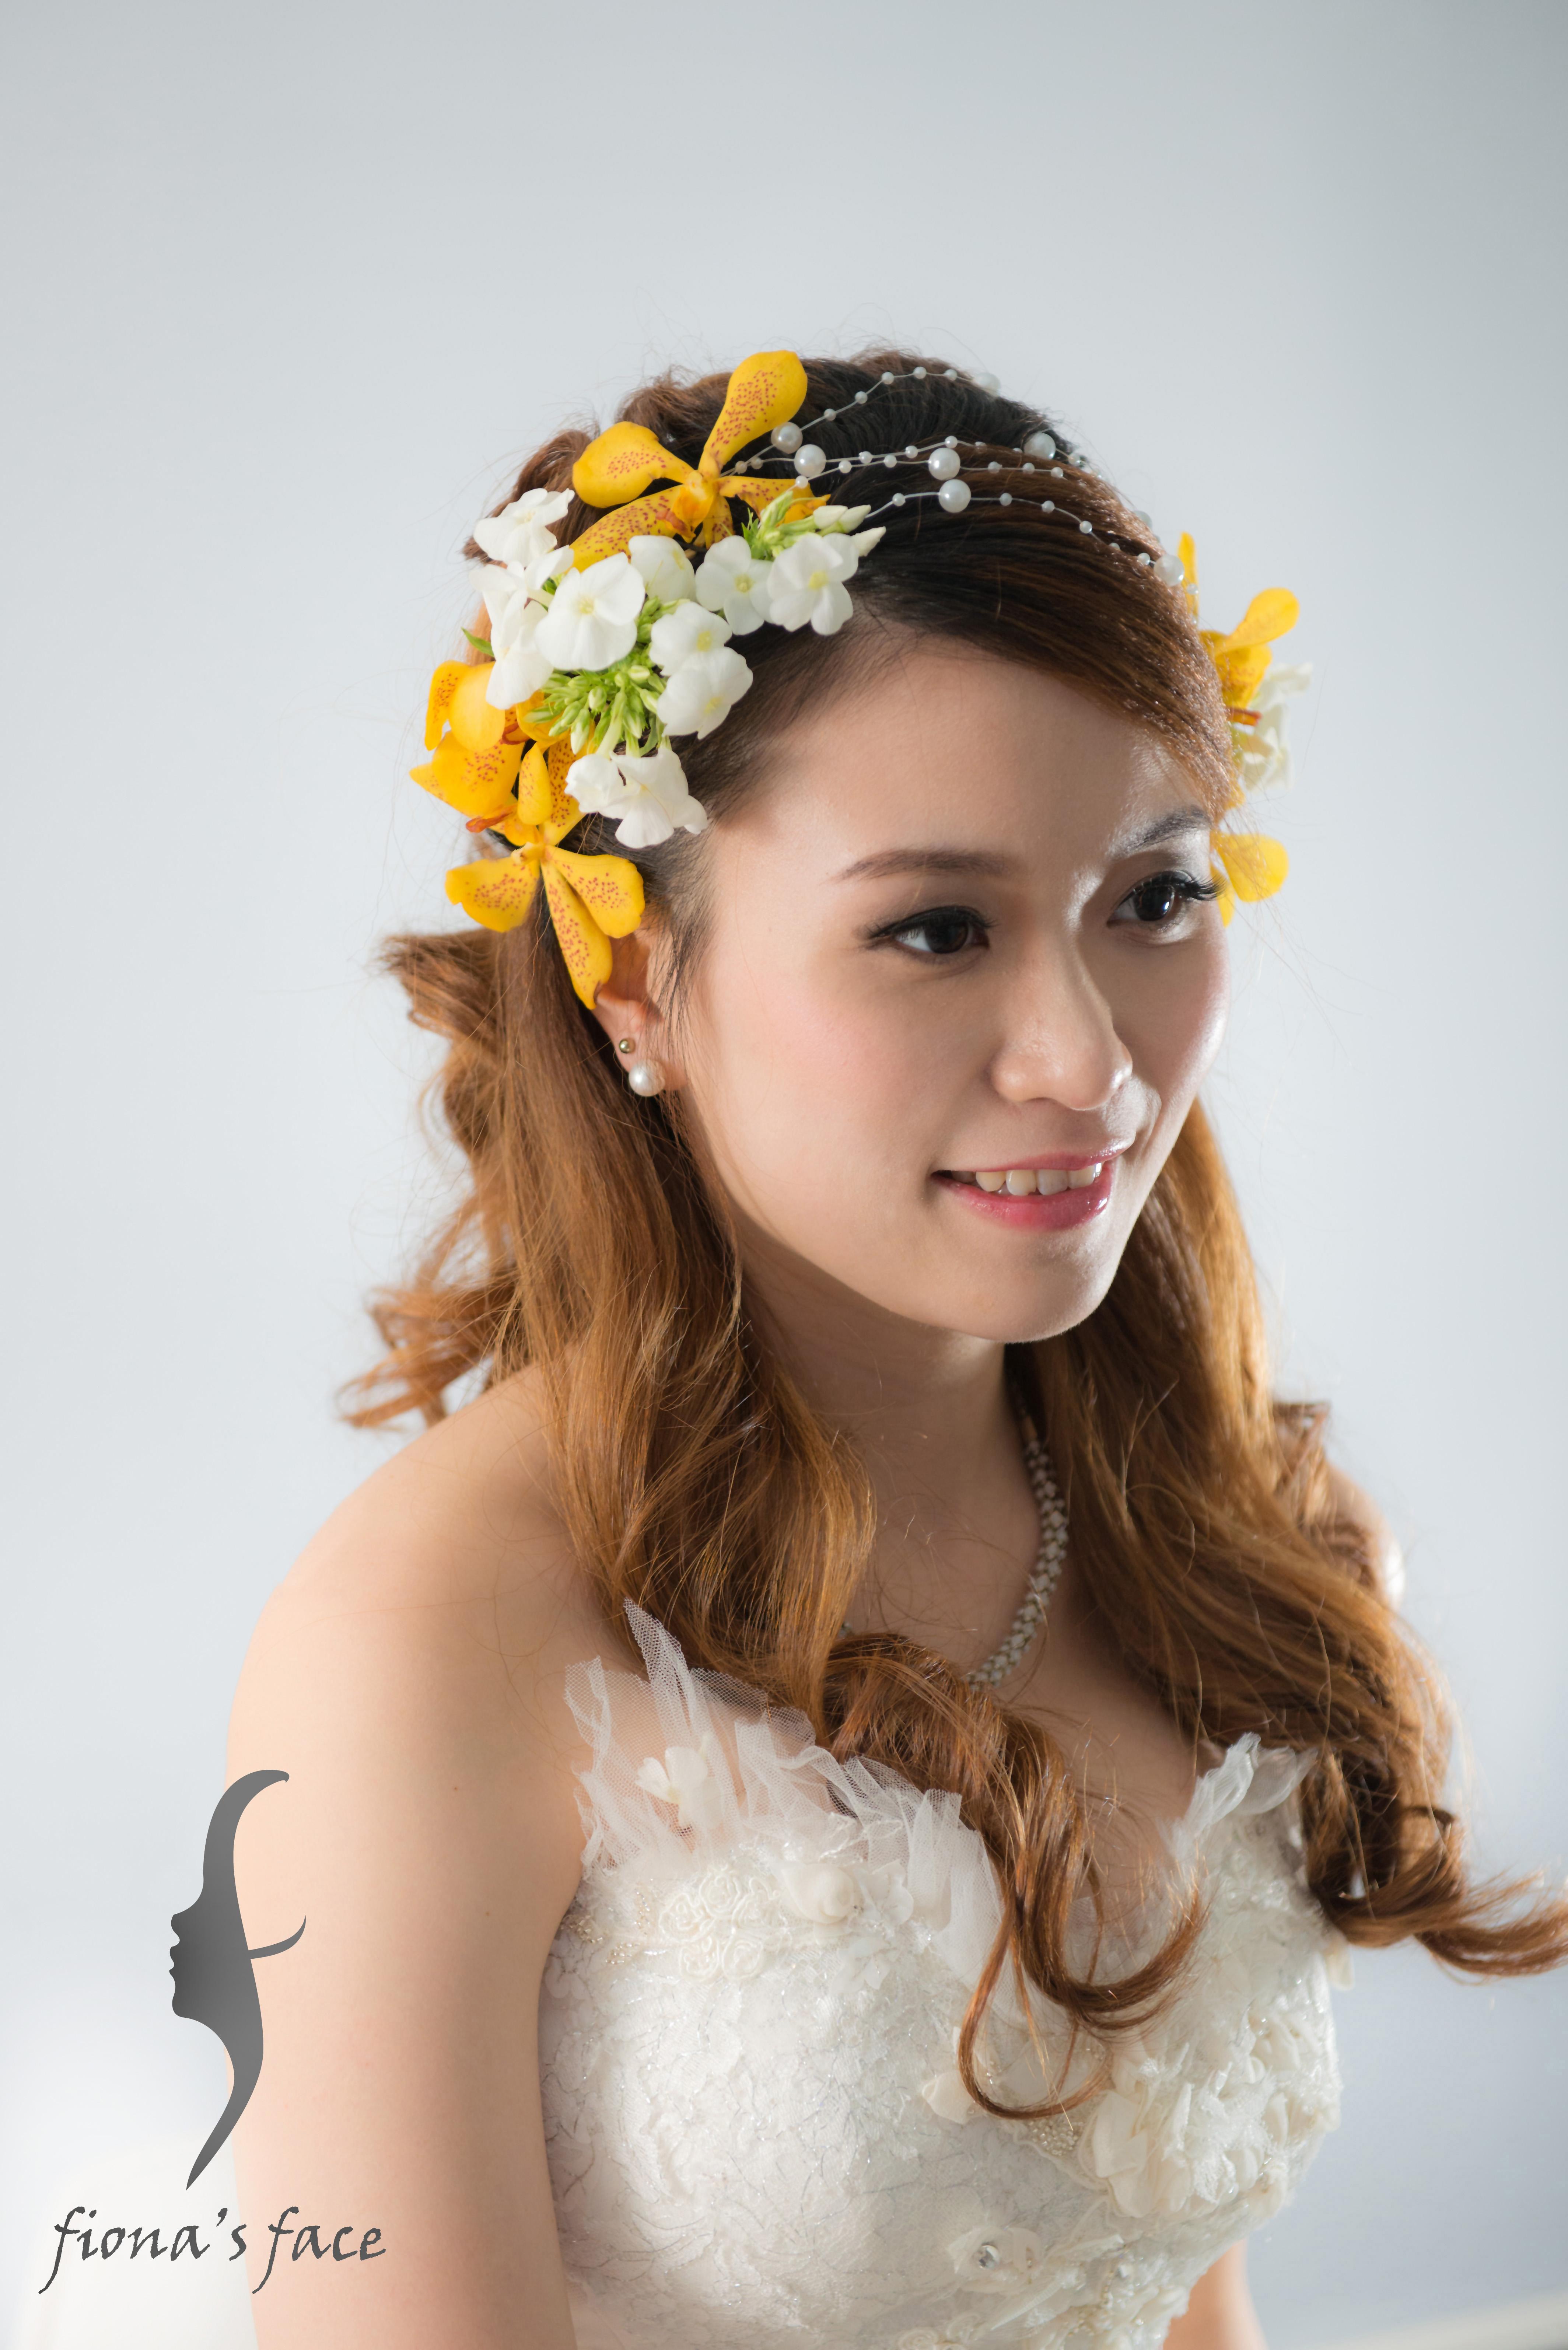 Nude & natural makeup Romantic long hairstyle with braids & tiny flowers 自然的妝容 黃色胡姬小花襯托織辮搭配披散浪漫大卷曲髮造型 是眾多新娘子喜愛的粉嫩形象